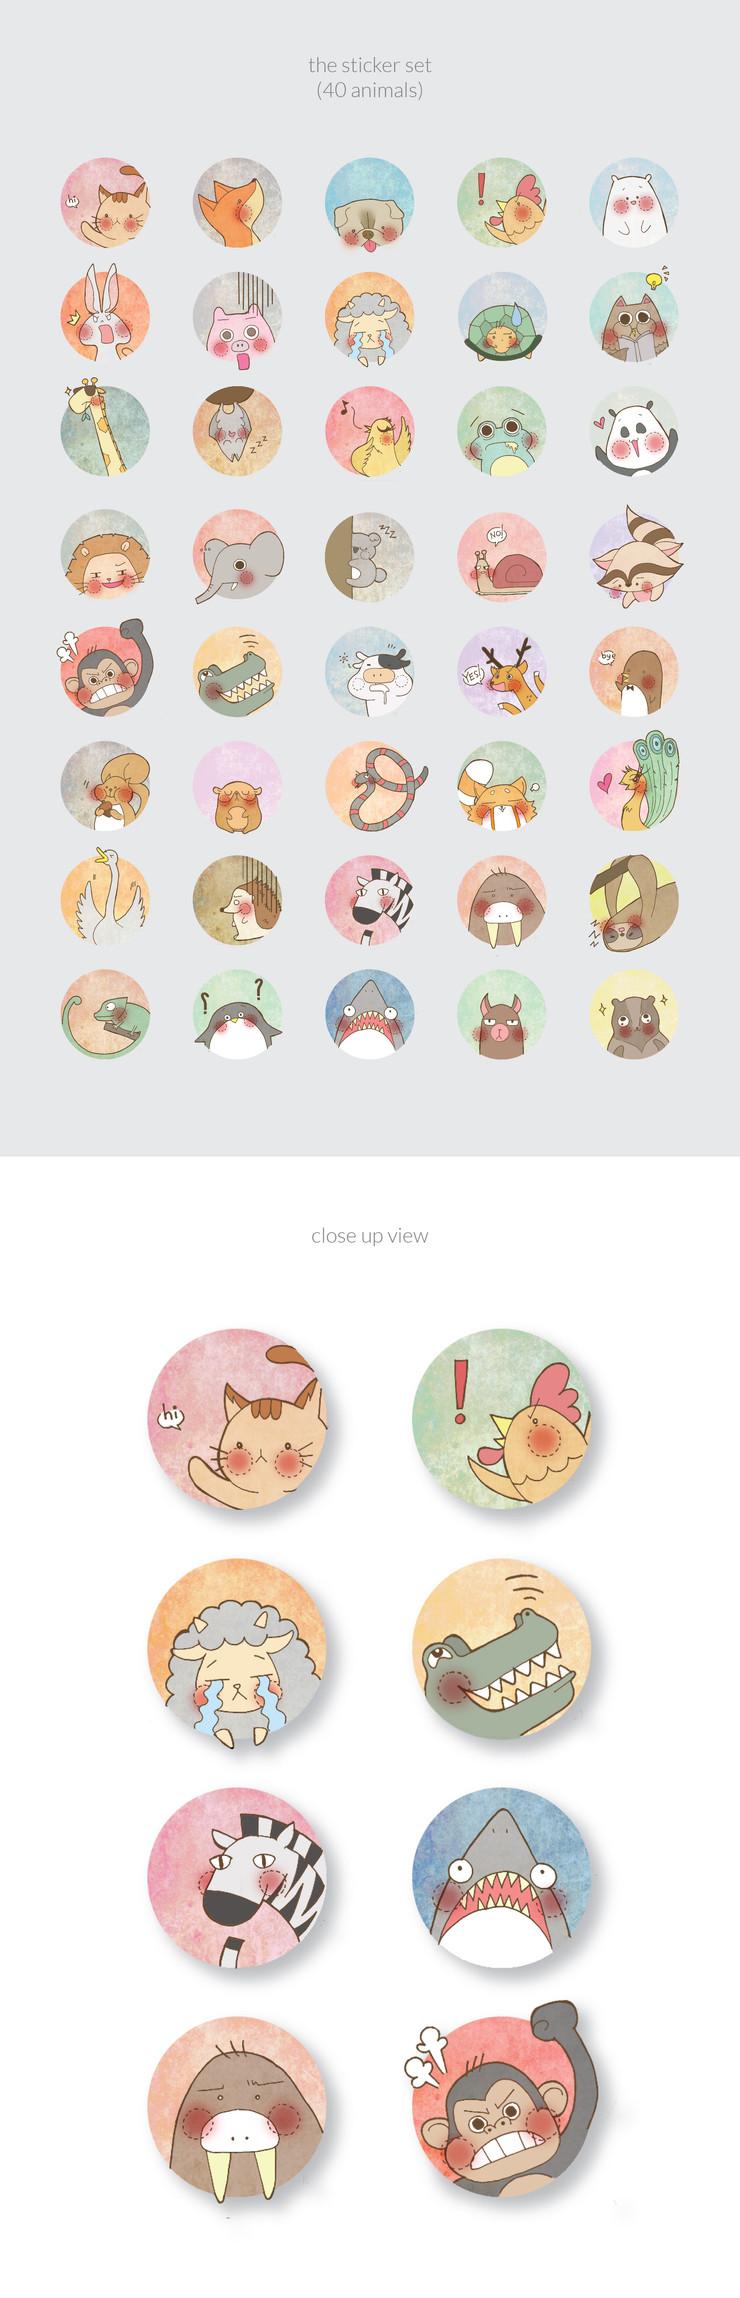 Cute Animal Kingdom Set